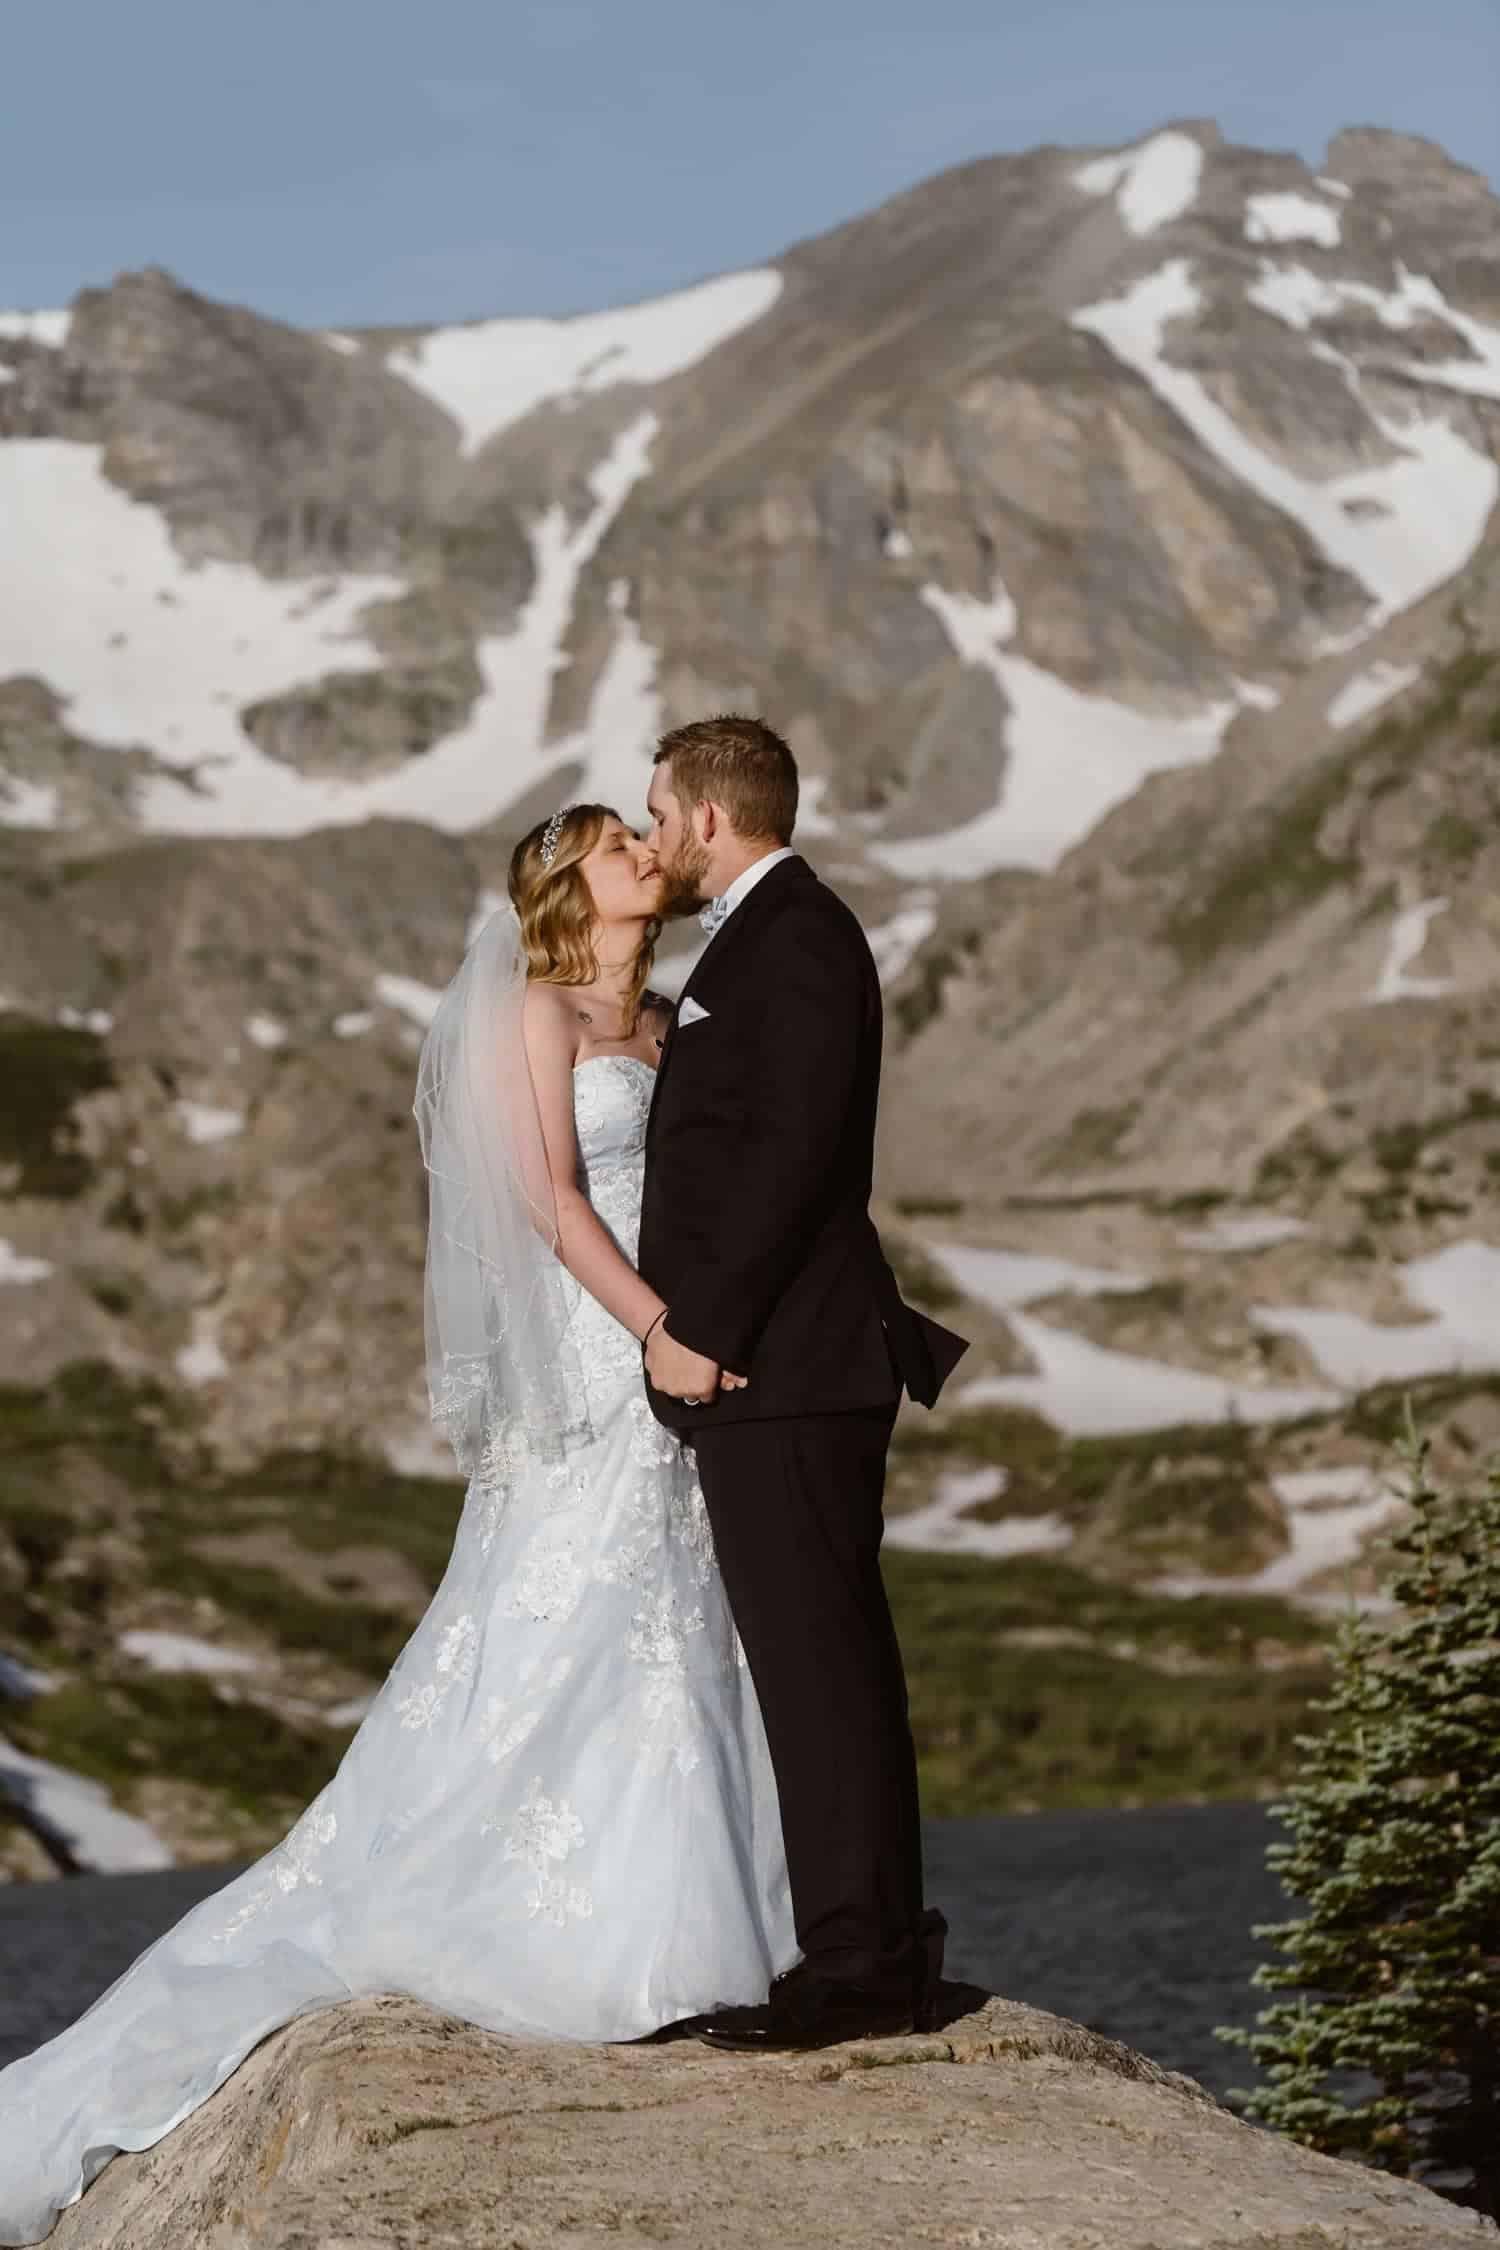 Bride and Groom Kissing at Lake  Colorado Adventure Elopement